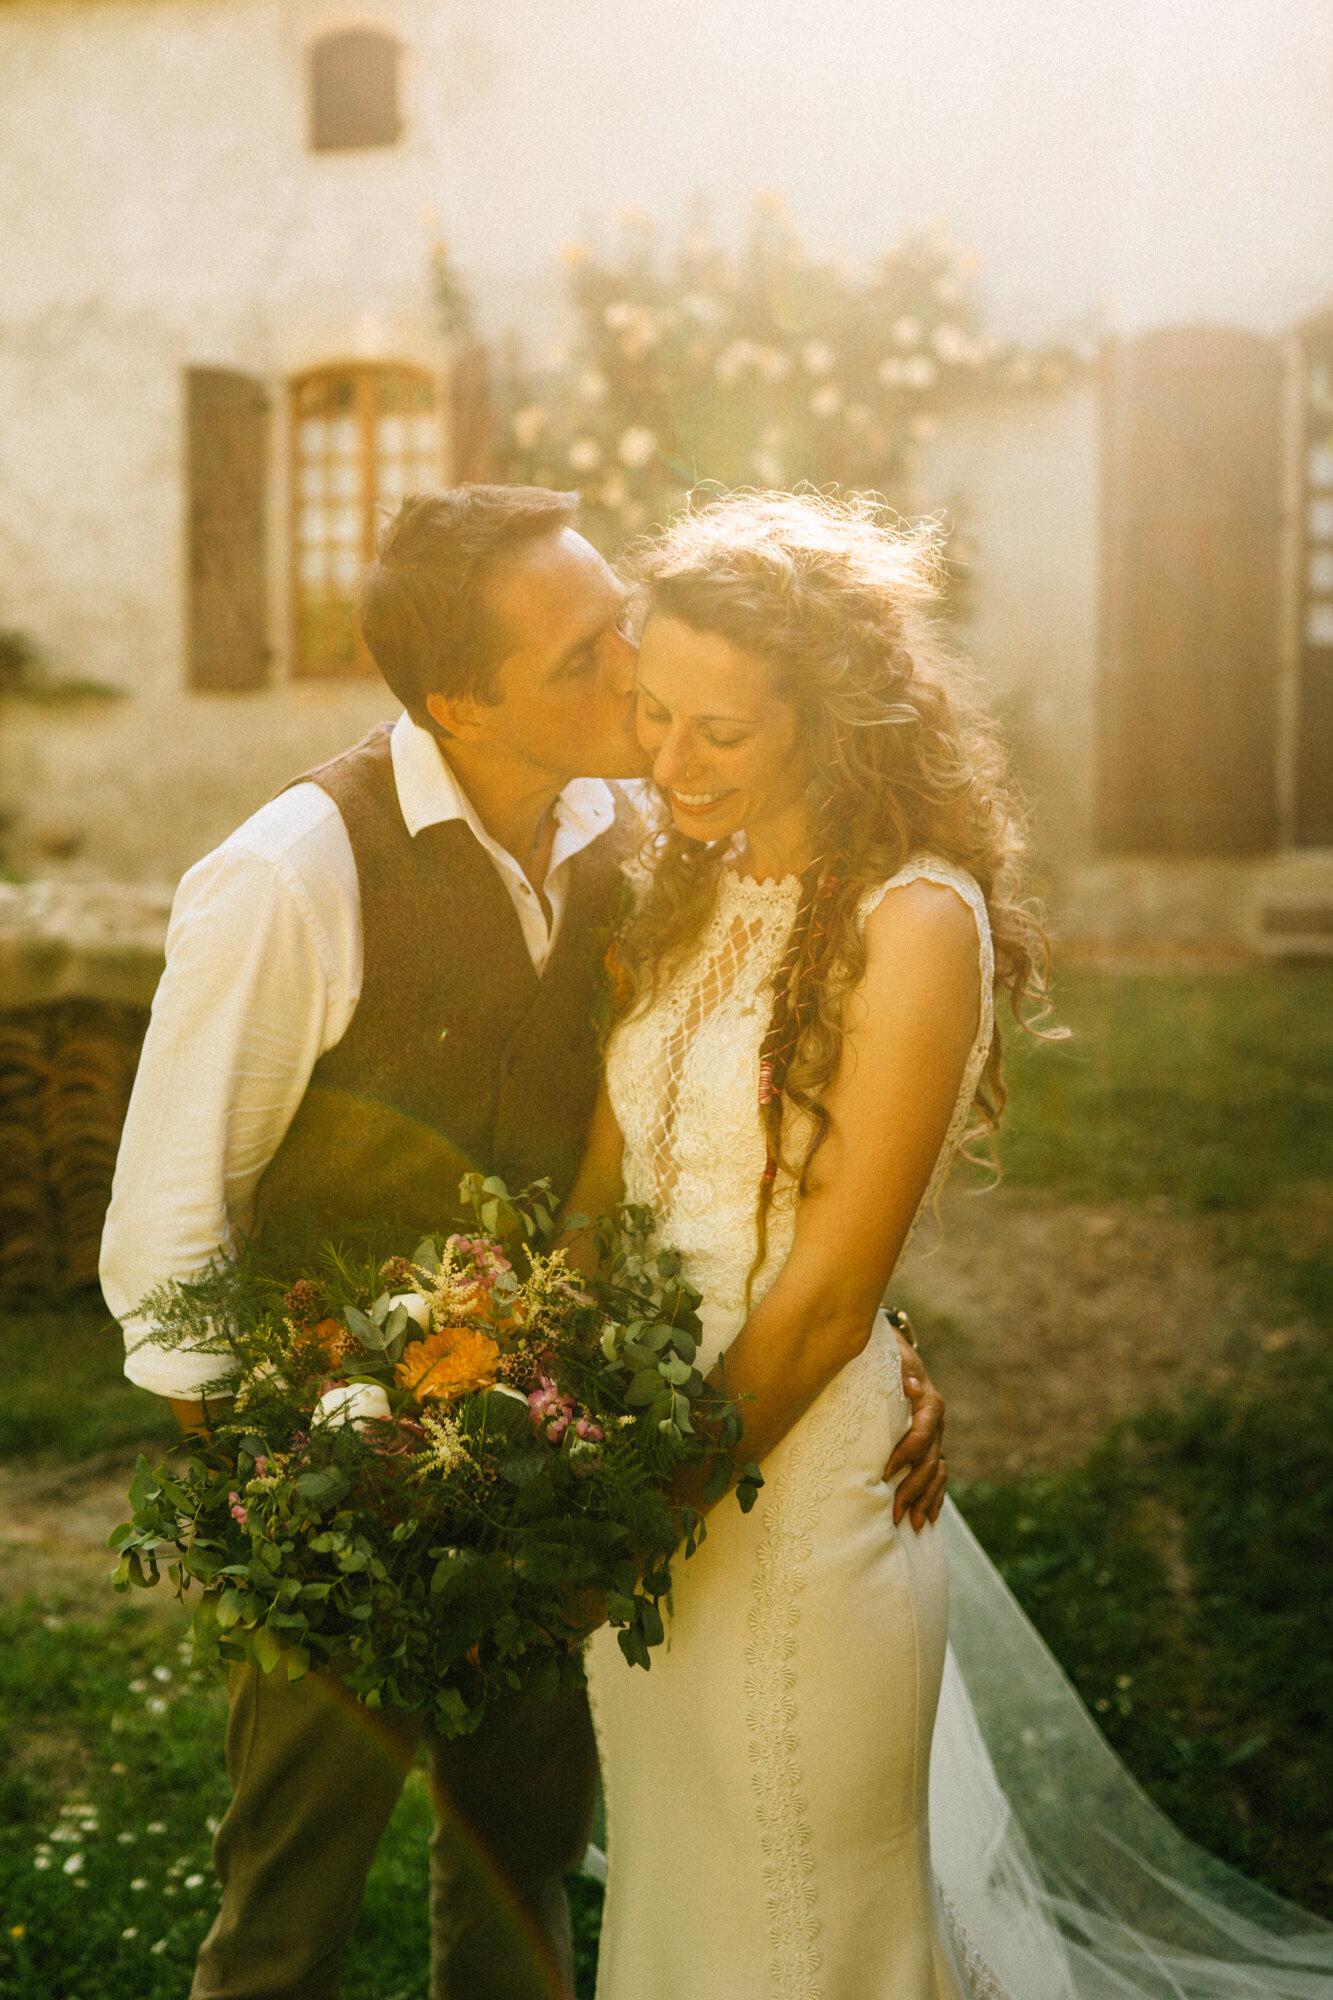 South of France wedding - Sophie and Julien